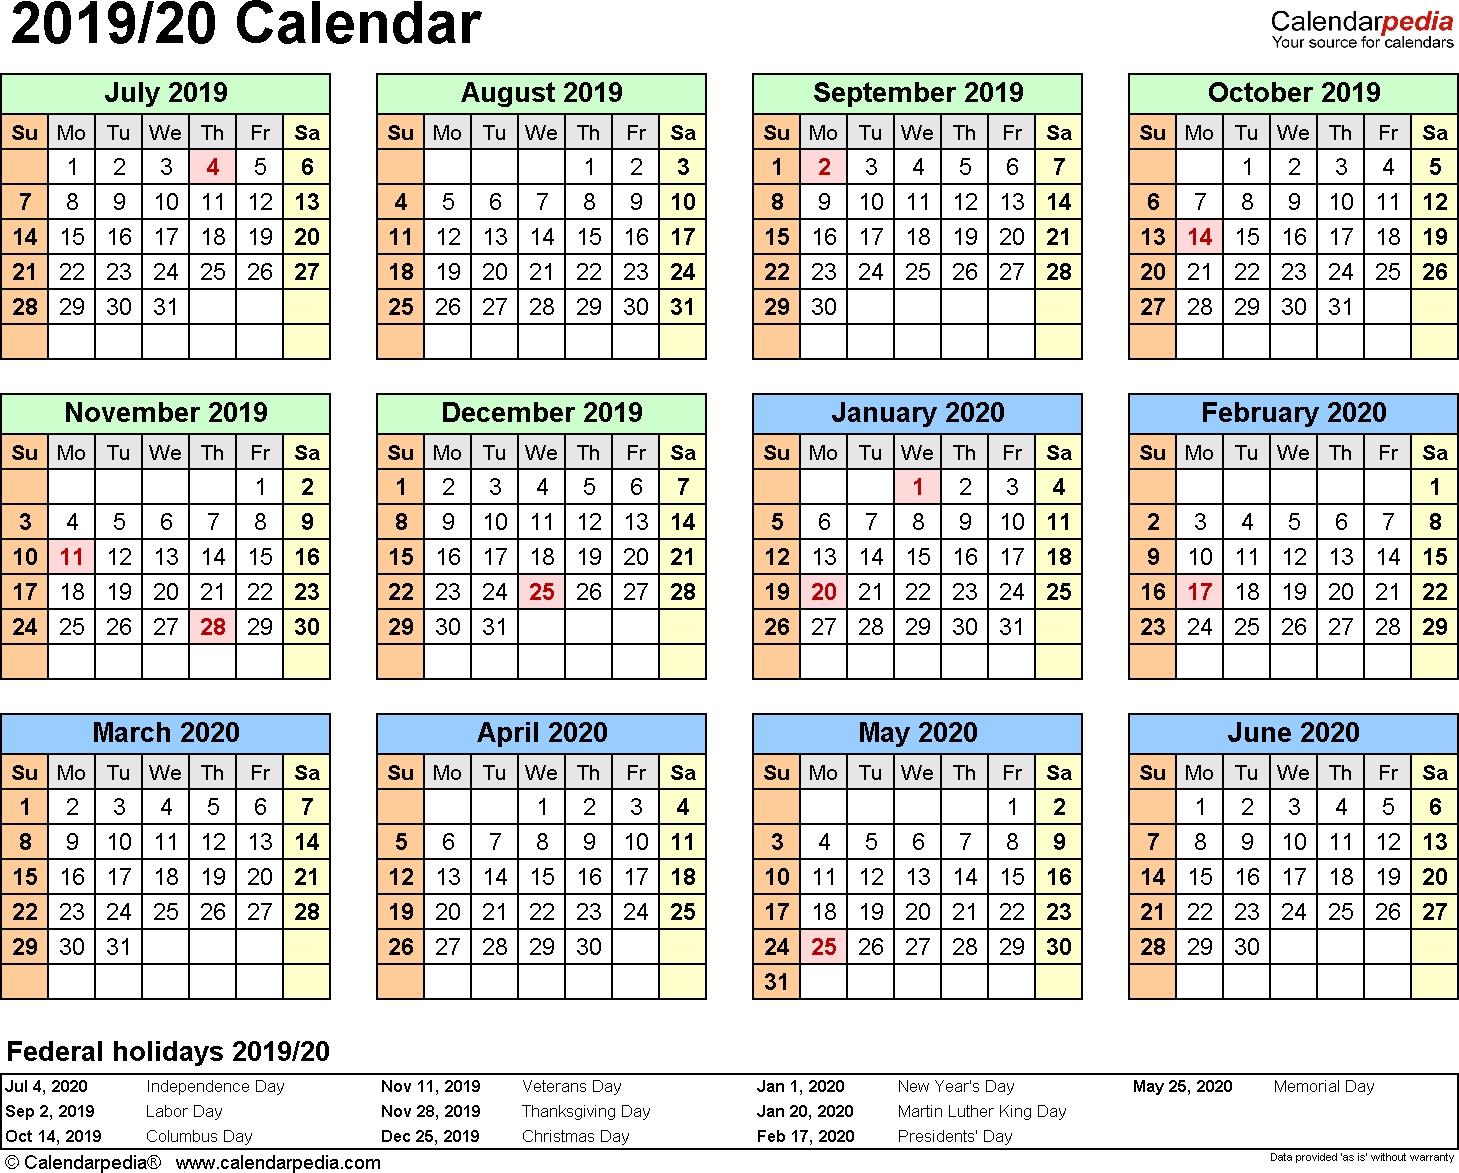 Split Year Calendar 2019/20 (July To June) - Word Templates regarding Year At A Glance Calendar 2019-2020